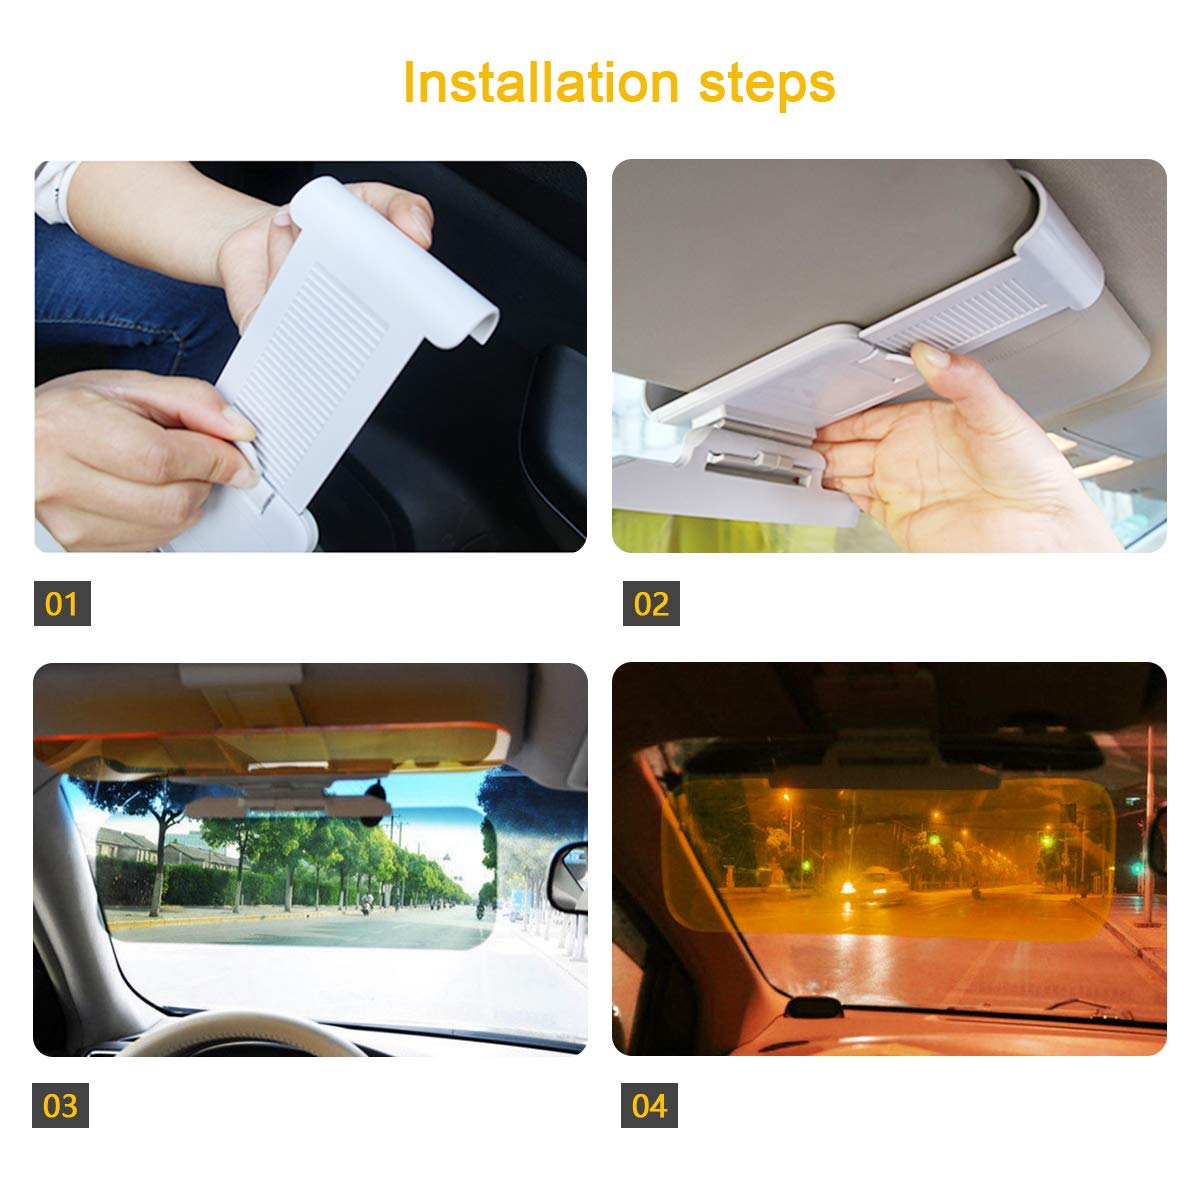 Anti-glare visor Car Anti-Glare Windshield Sun Visor Extender 2 in 1 Day and Night Driving Visor for Protects Against UV rays Headlights Tailgates Reduces Eye Strain